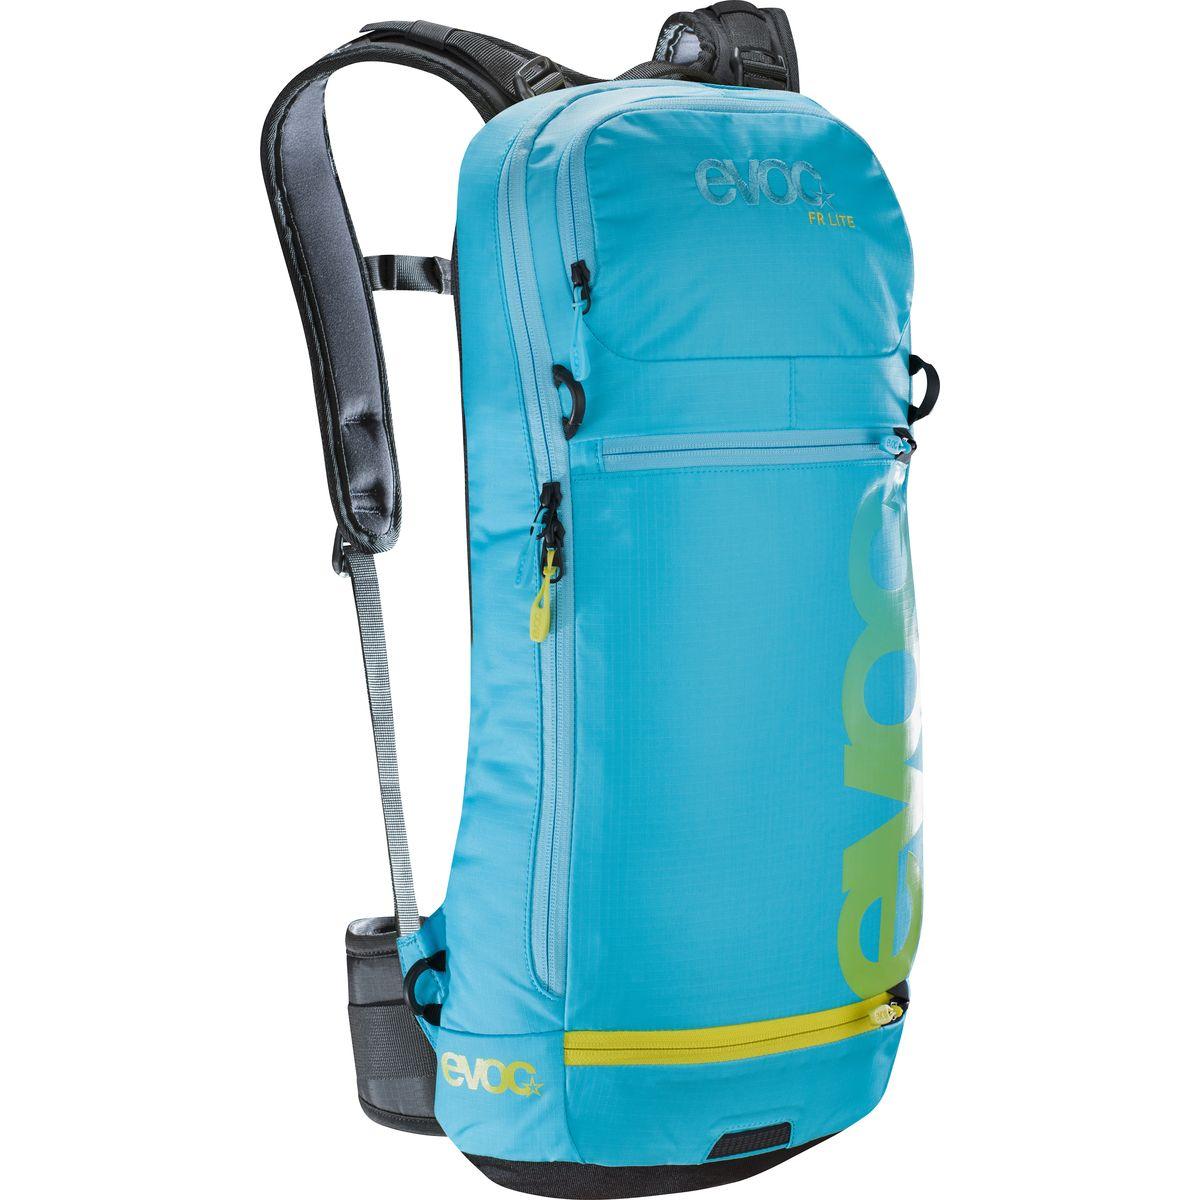 Evoc FR Lite Protector Hydration Backpack Neon Blue, M/L